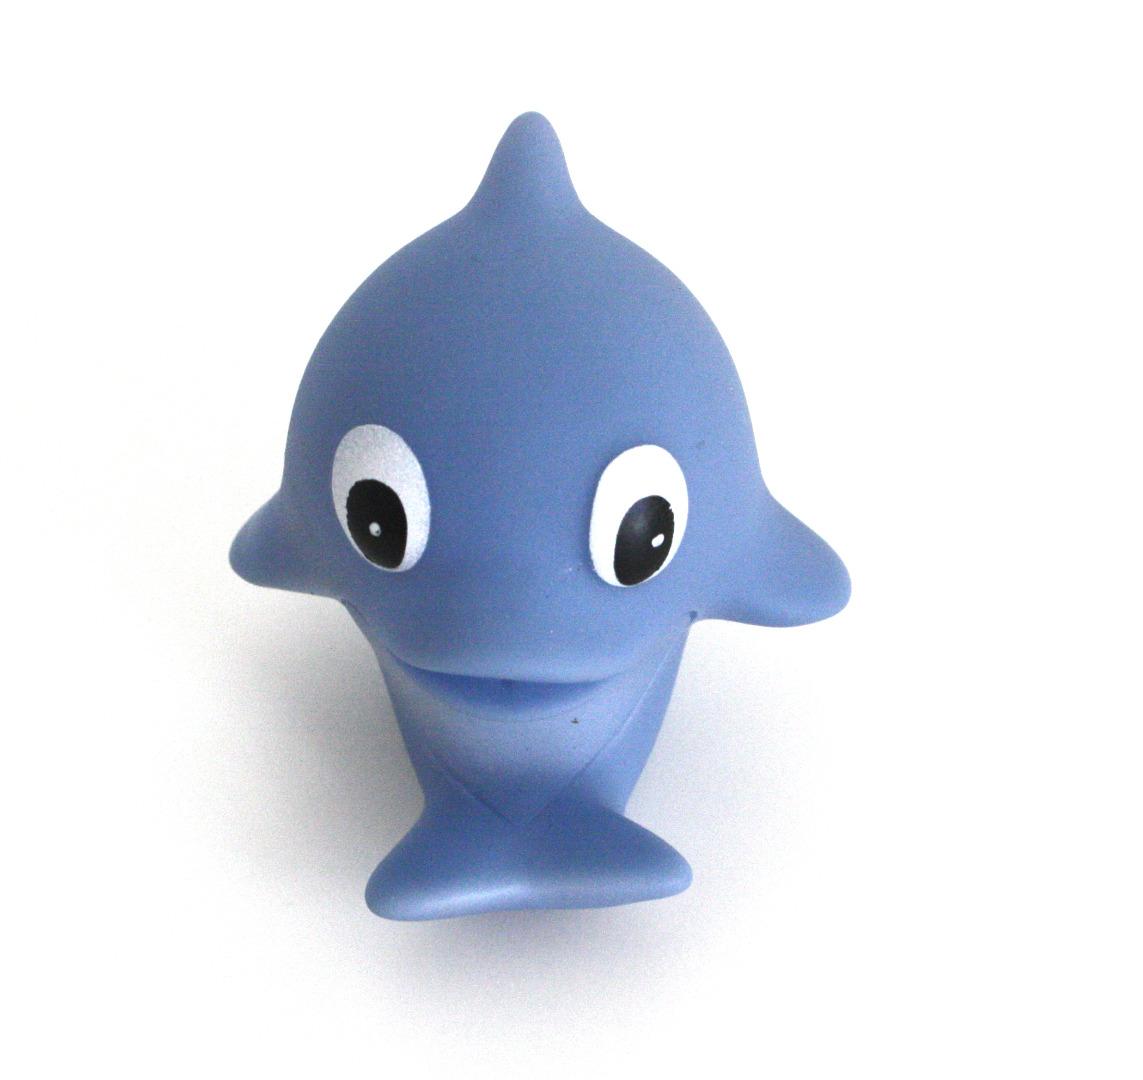 Wasserspritztiere Wal Walross Delfin Robbe 9